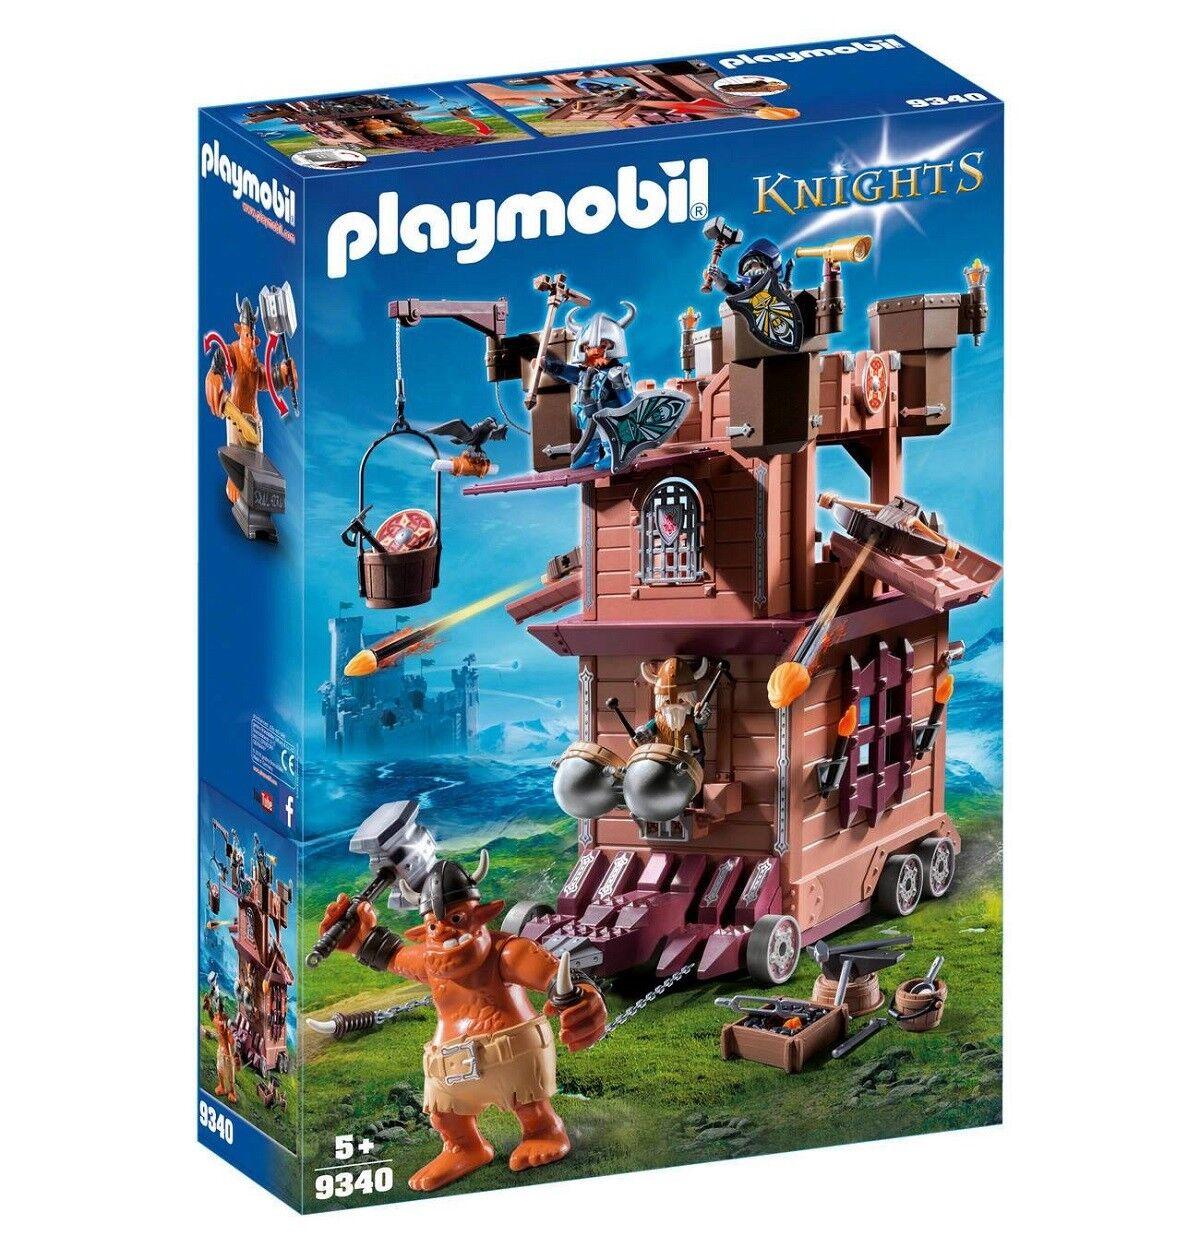 PLAYMOBIL ® Knights-Mobile nains Forteresse  - 9340-Neuf  commander en ligne